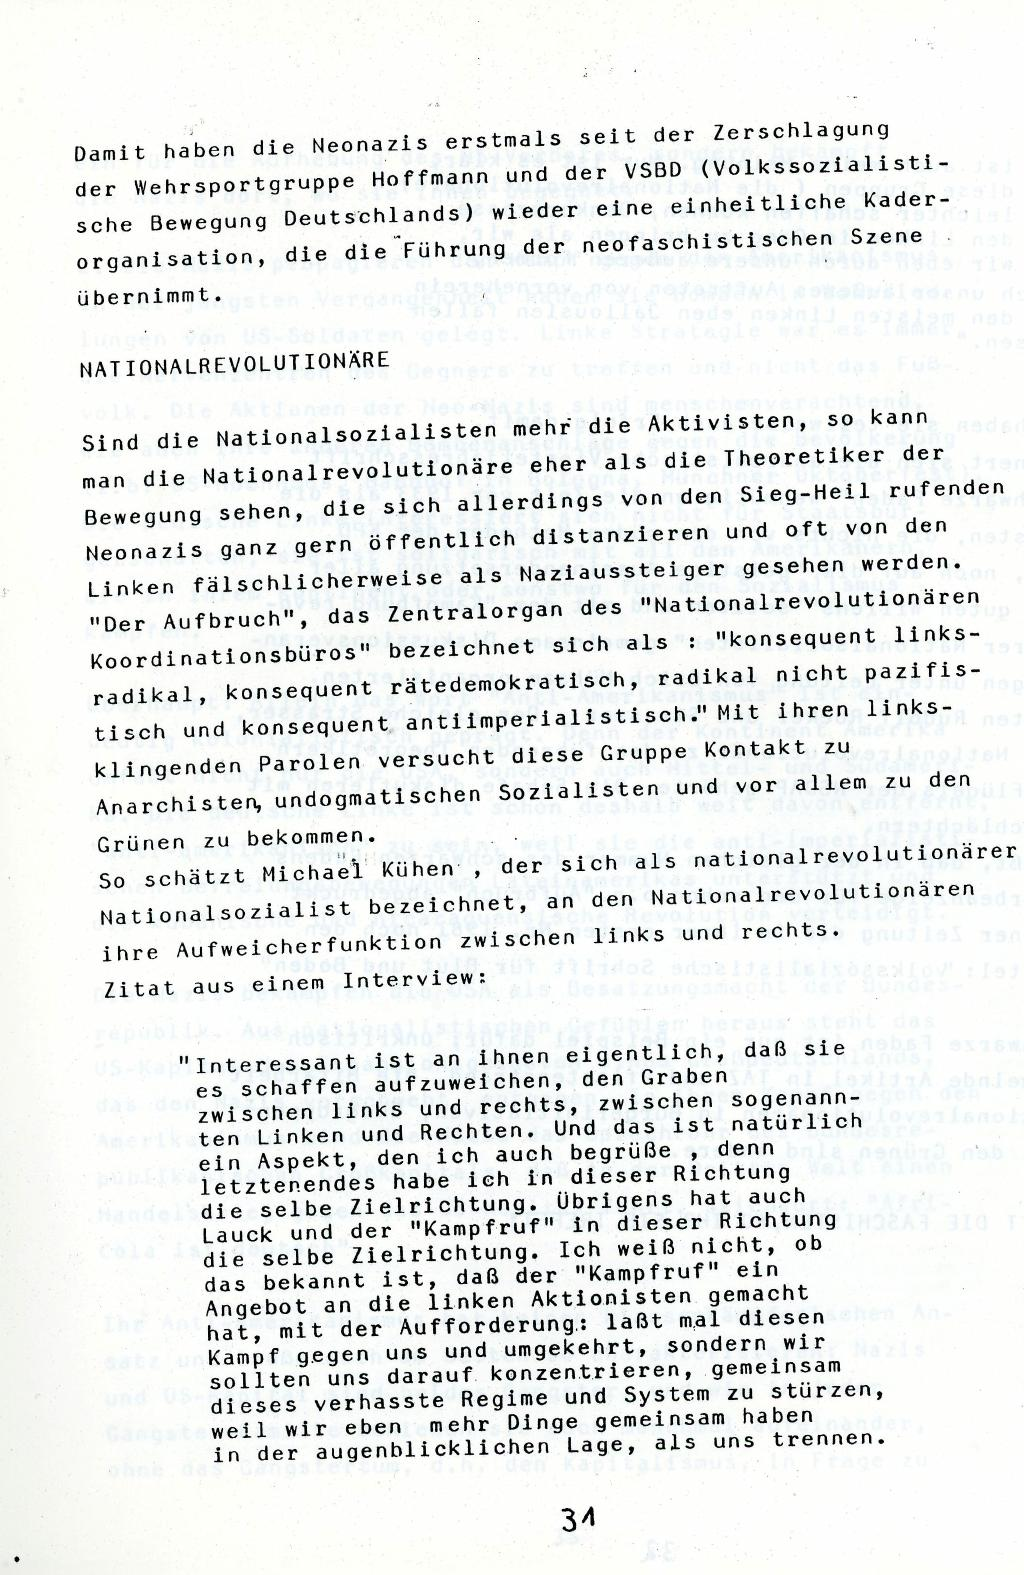 Berlin_1983_Autonome_Gruppen_Faschismus_im_Kapitalismus_31